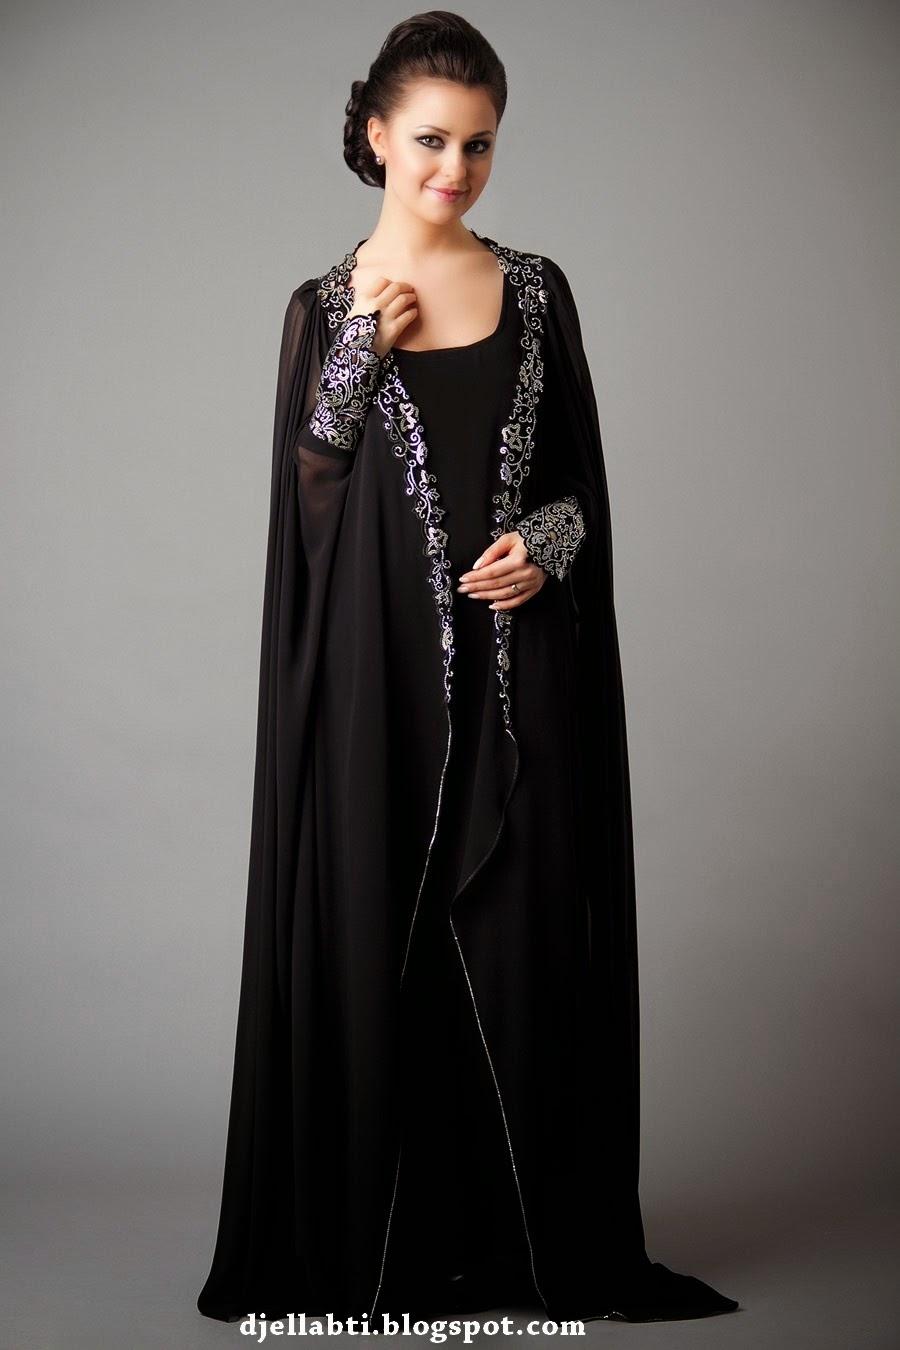 Abaya, Collection Noir, Abaya noir, femme, abaya luxe, abaya marocaine,djellabti.blogspot.com, djellabti,